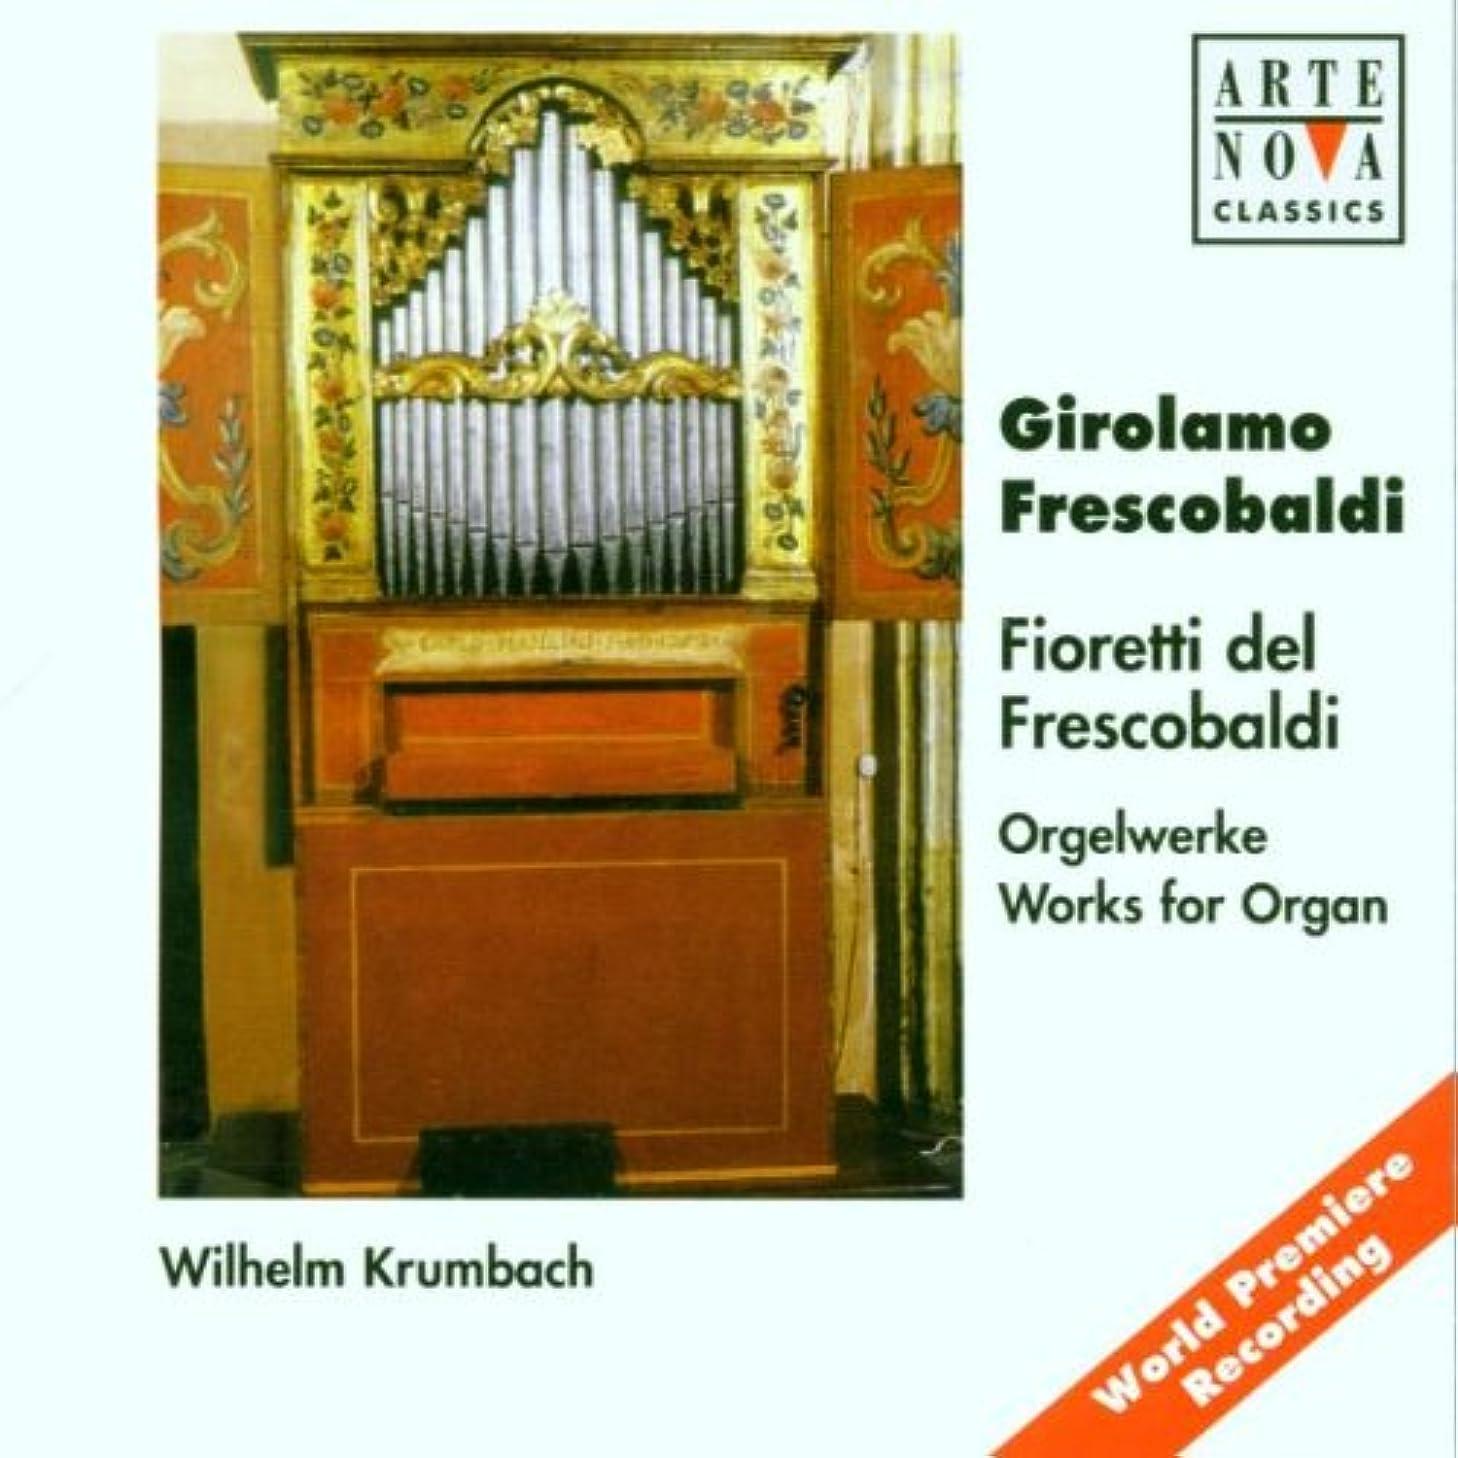 Frescobaldi: Organ Works - Canzona I - XI, Toccata / Krumbach